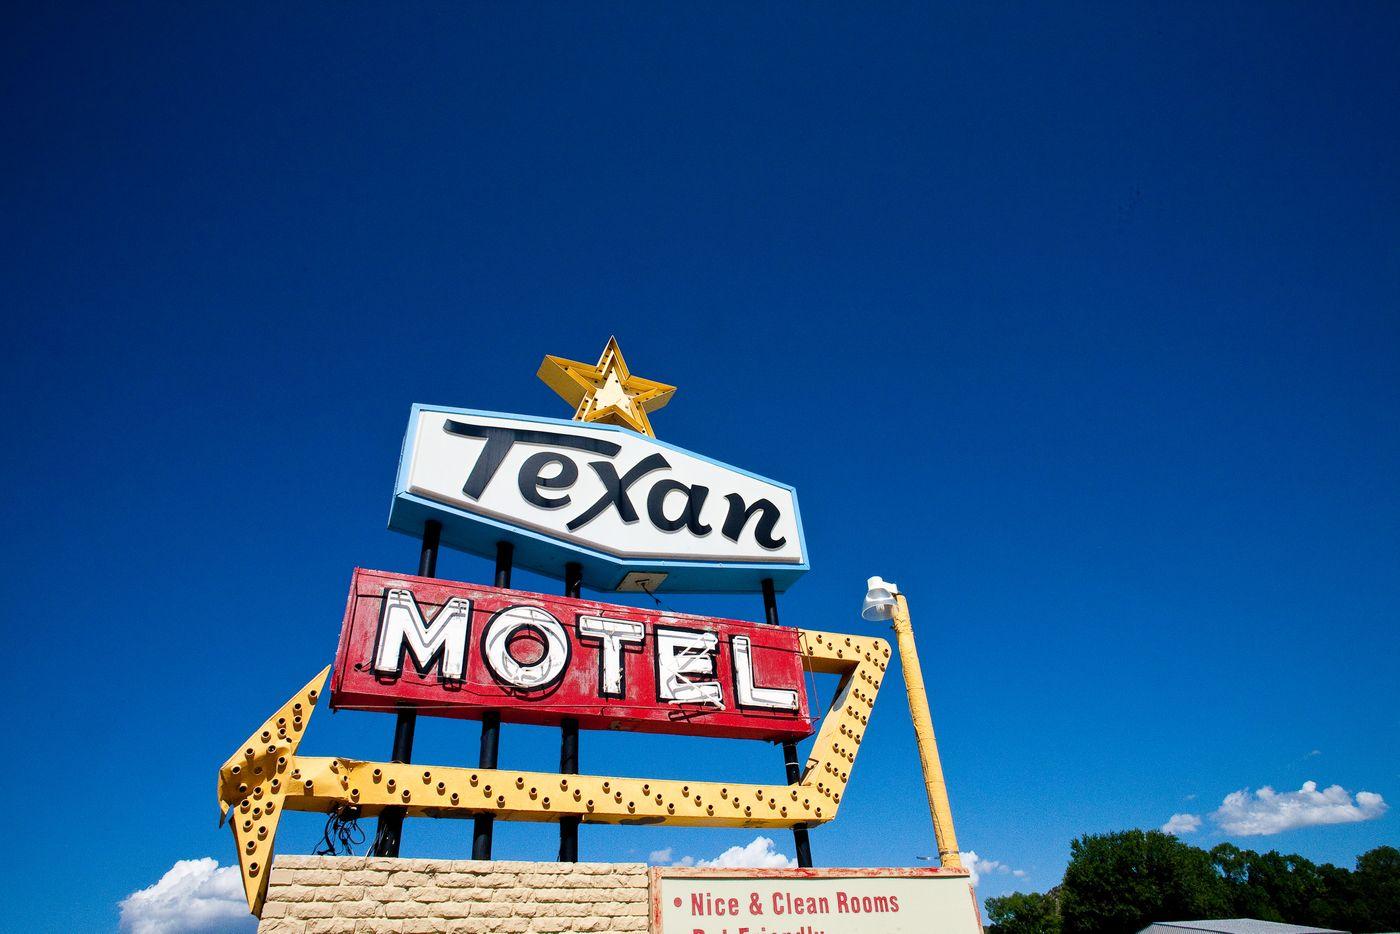 motel_2017_2018-4-WEB.jpg